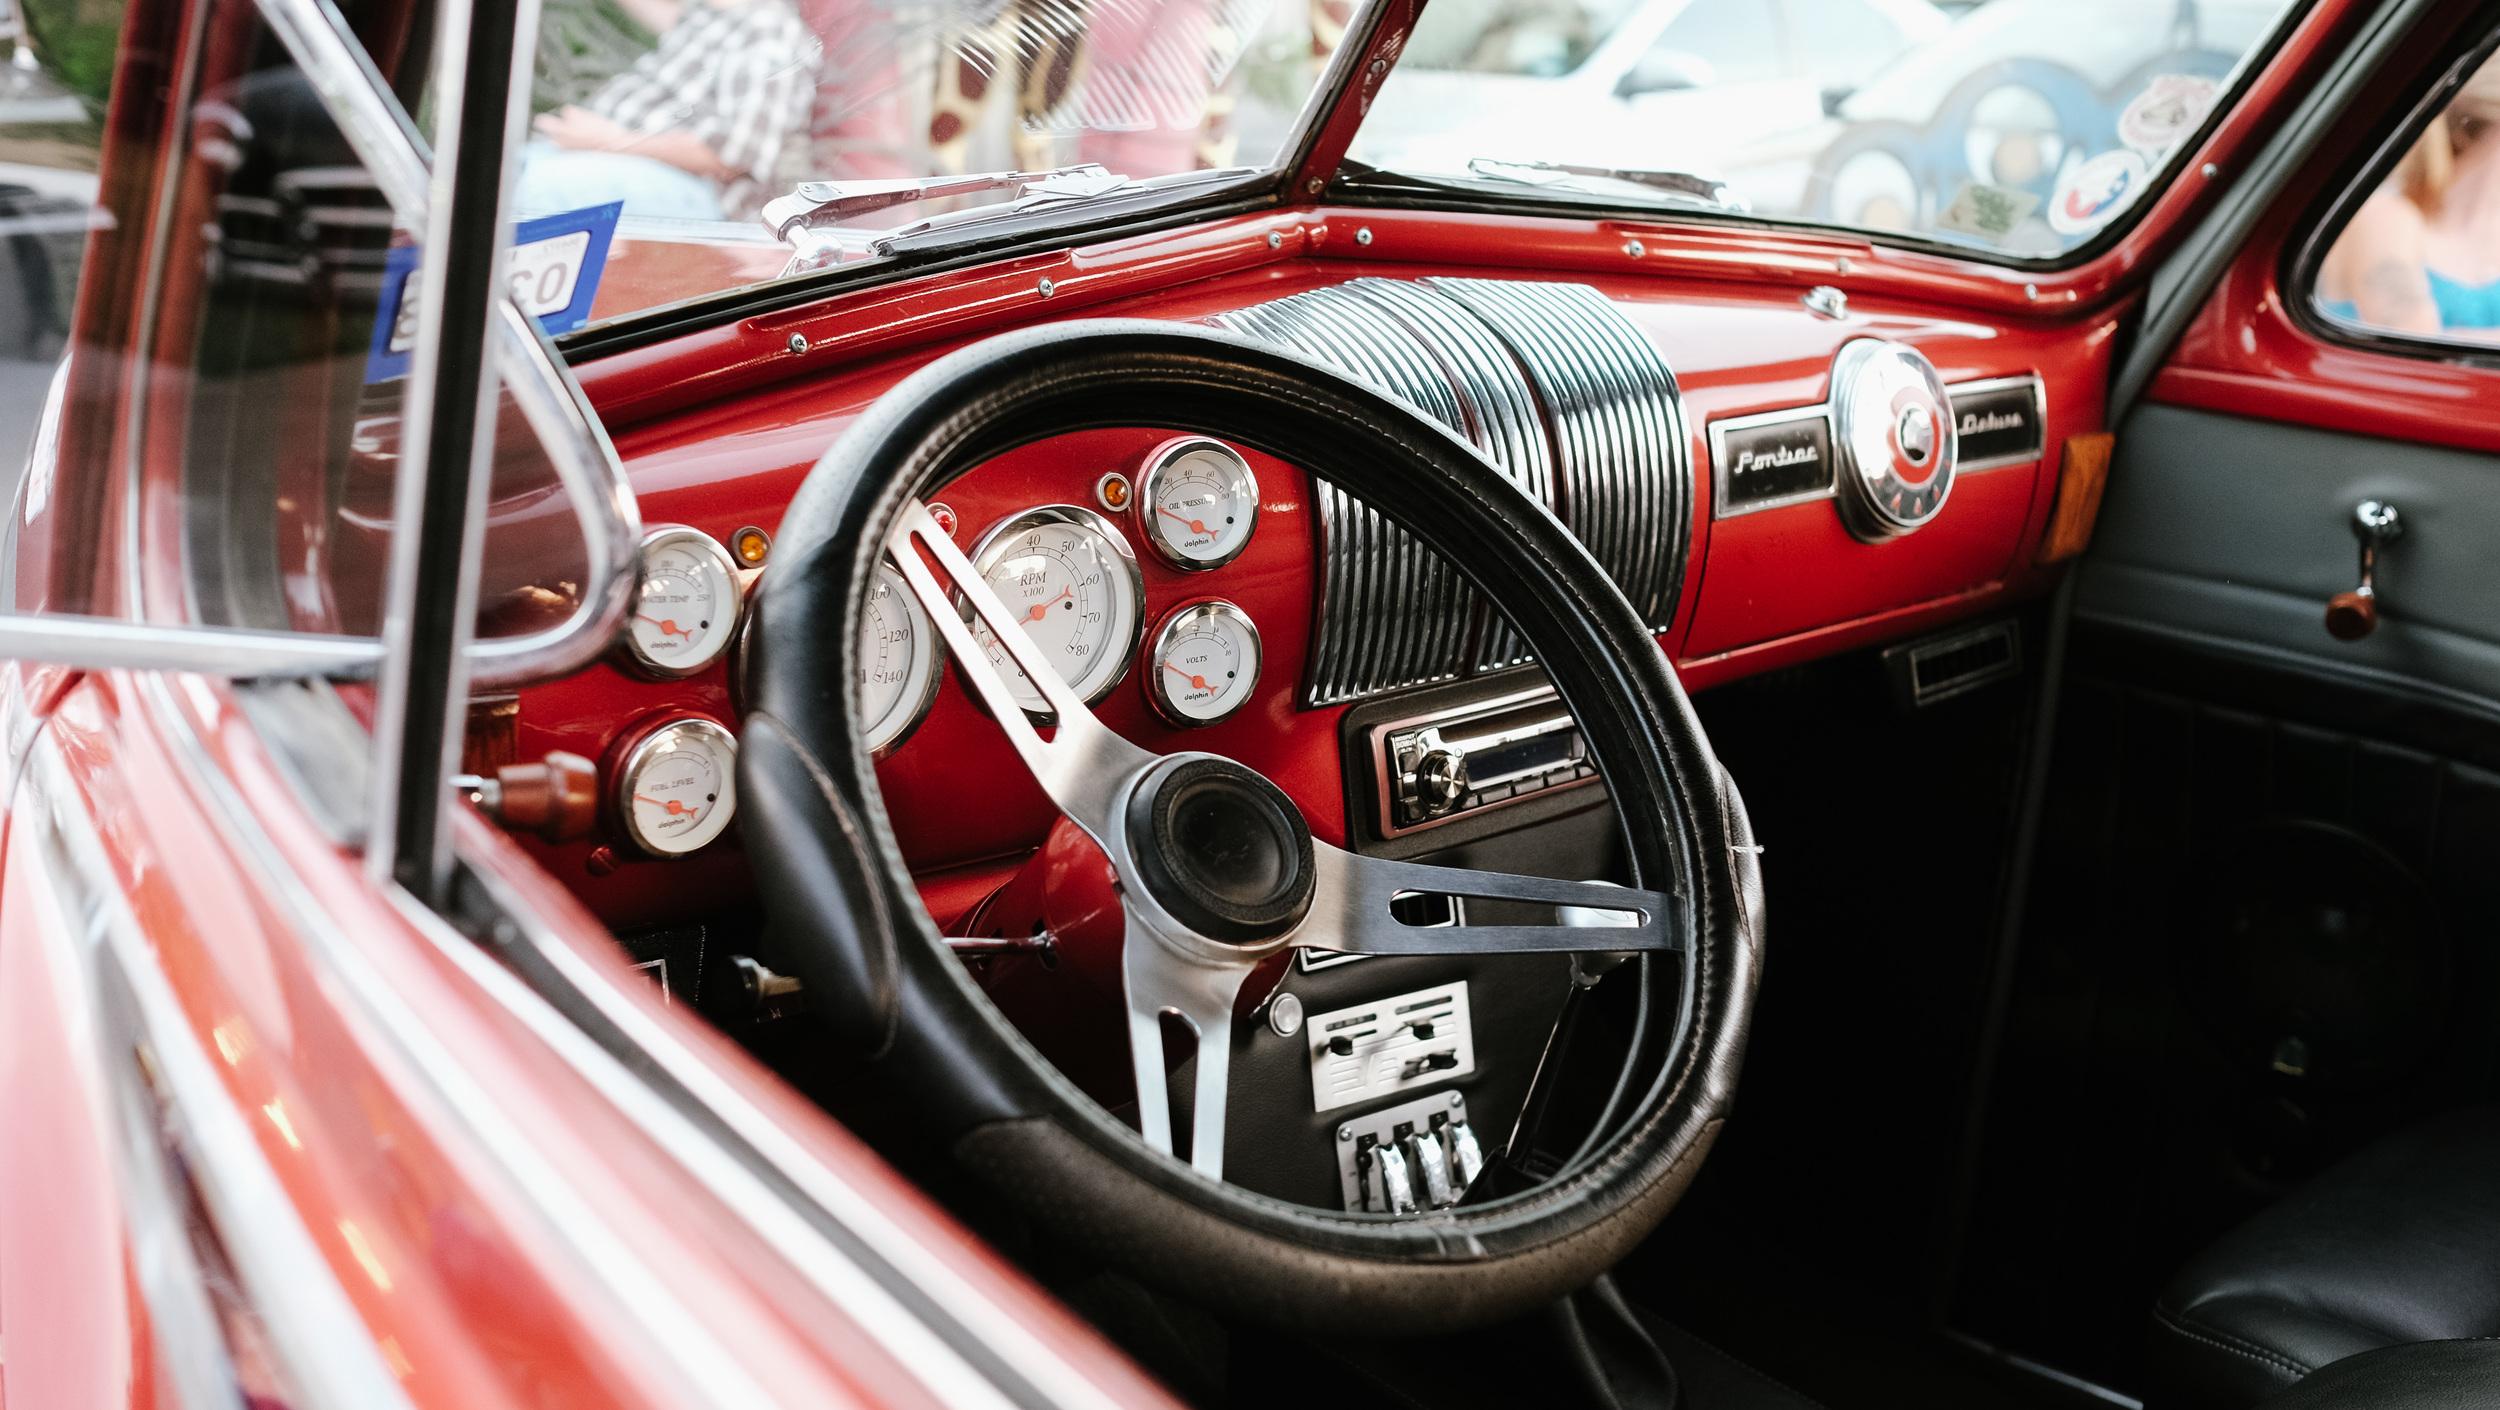 Top-Notch-Car-Show-09052015-2557.jpg